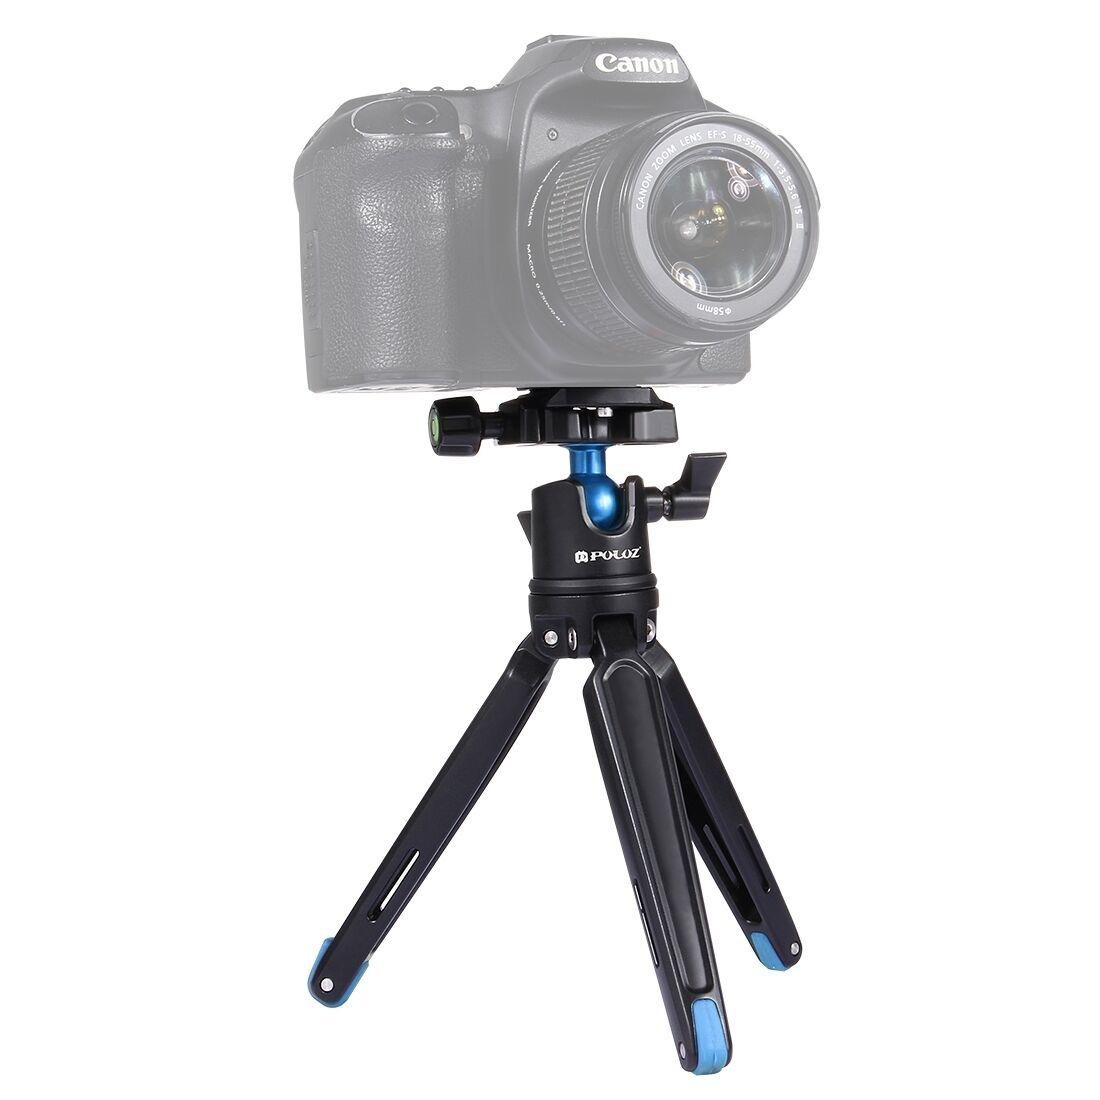 PULUZ 360 학위 볼 헤드 조절 데스크탑 삼각대 마운트/전화/GoPro 스포츠 카메라